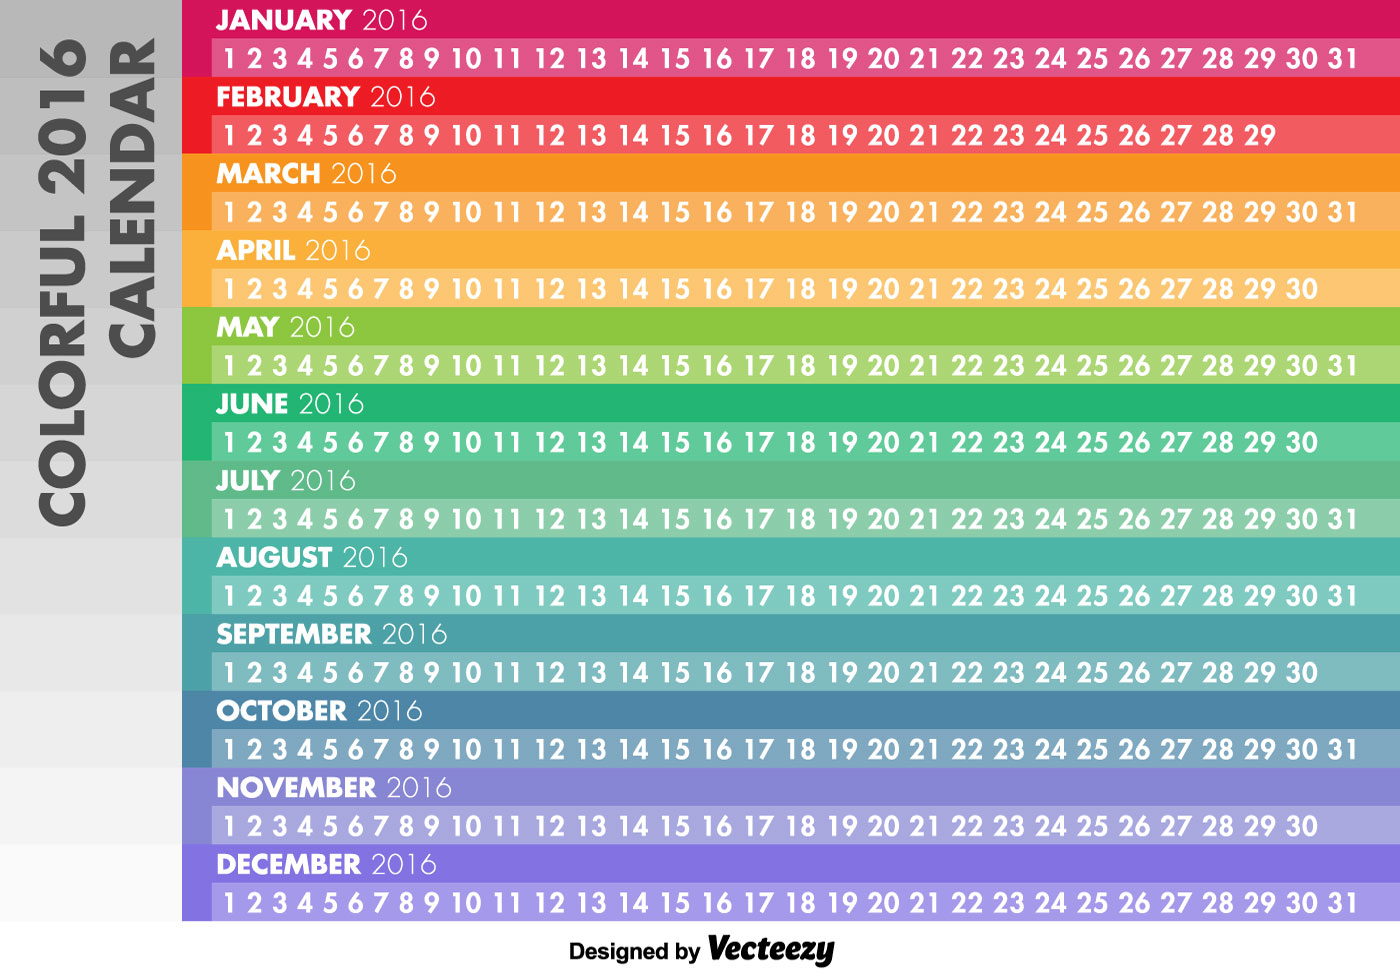 2016 Linear Calendar - Download Free Vector Art, Stock ...